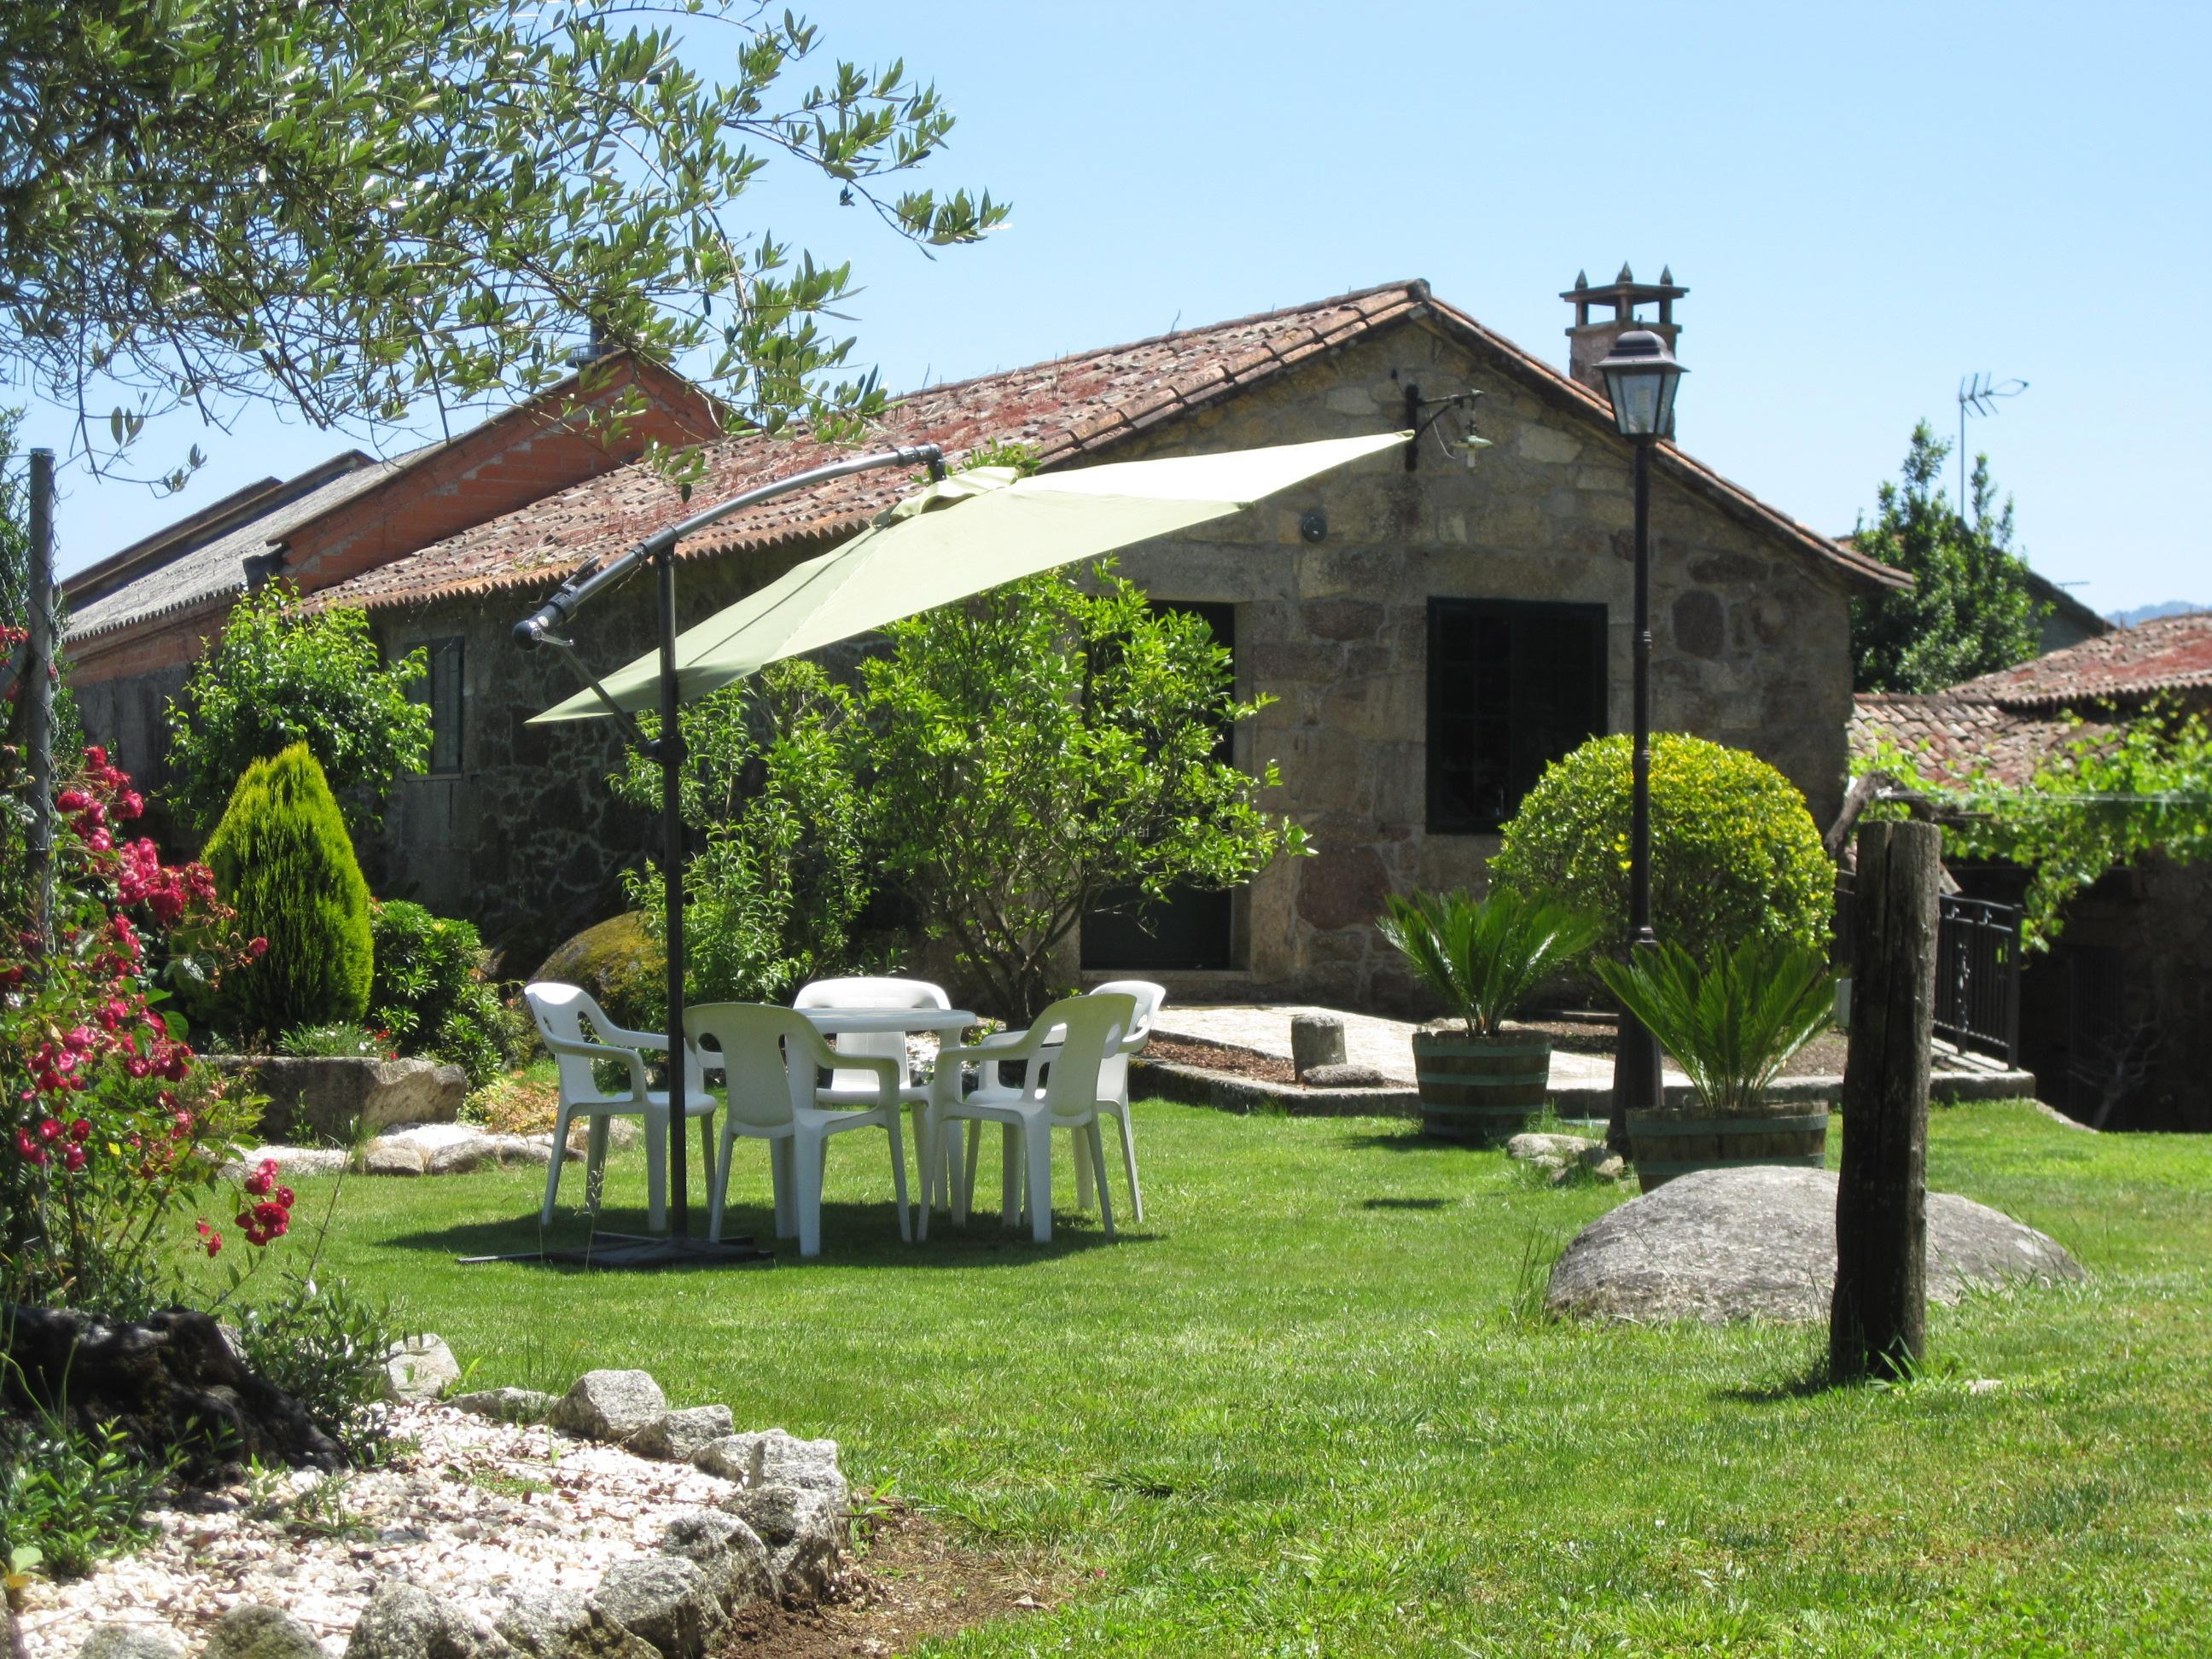 Fotos de a vi a do souto pontevedra portas clubrural - Casas rurales de galicia ...